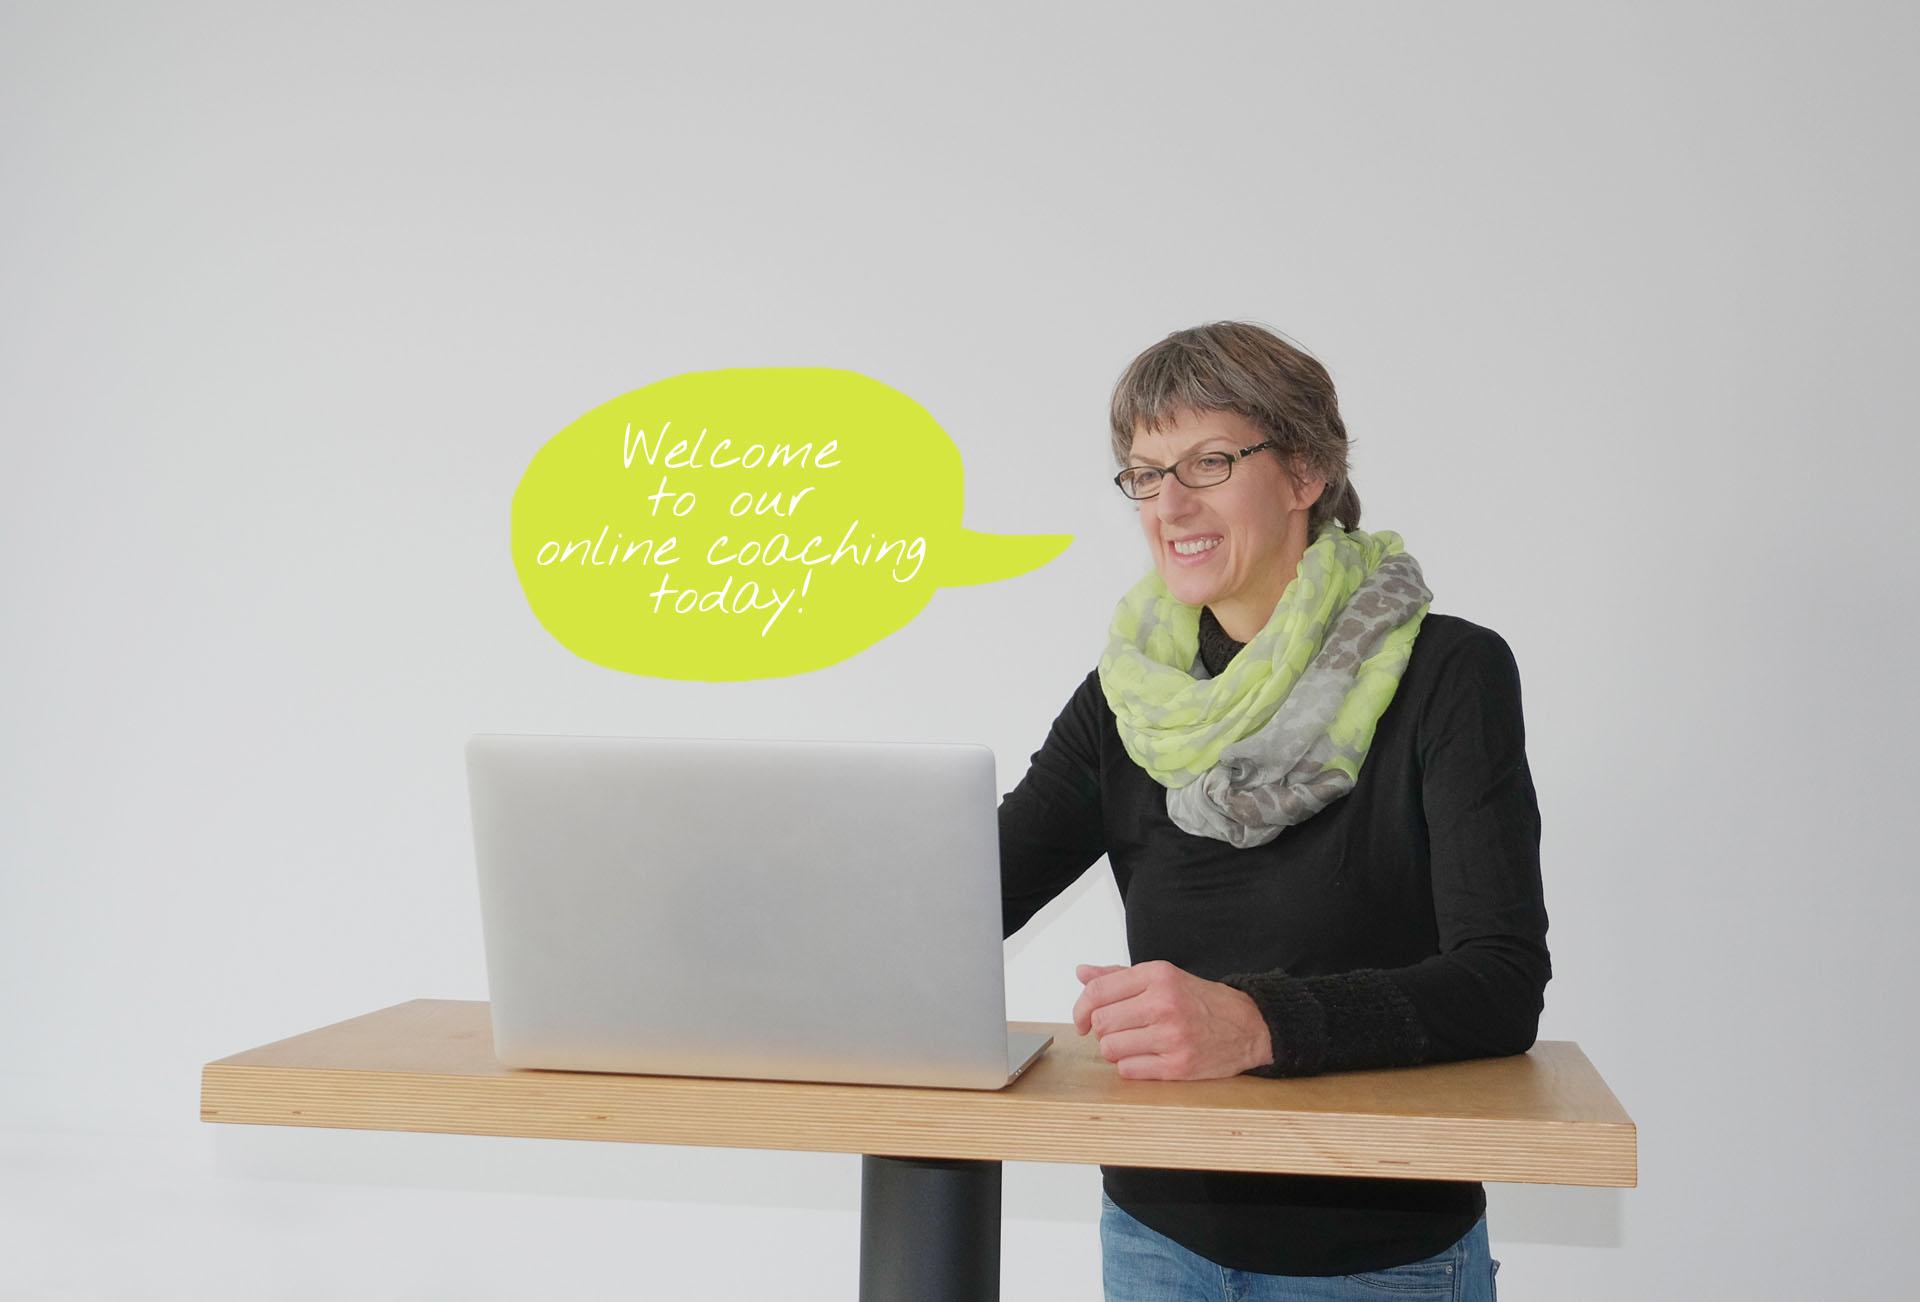 Businesscoaching Online